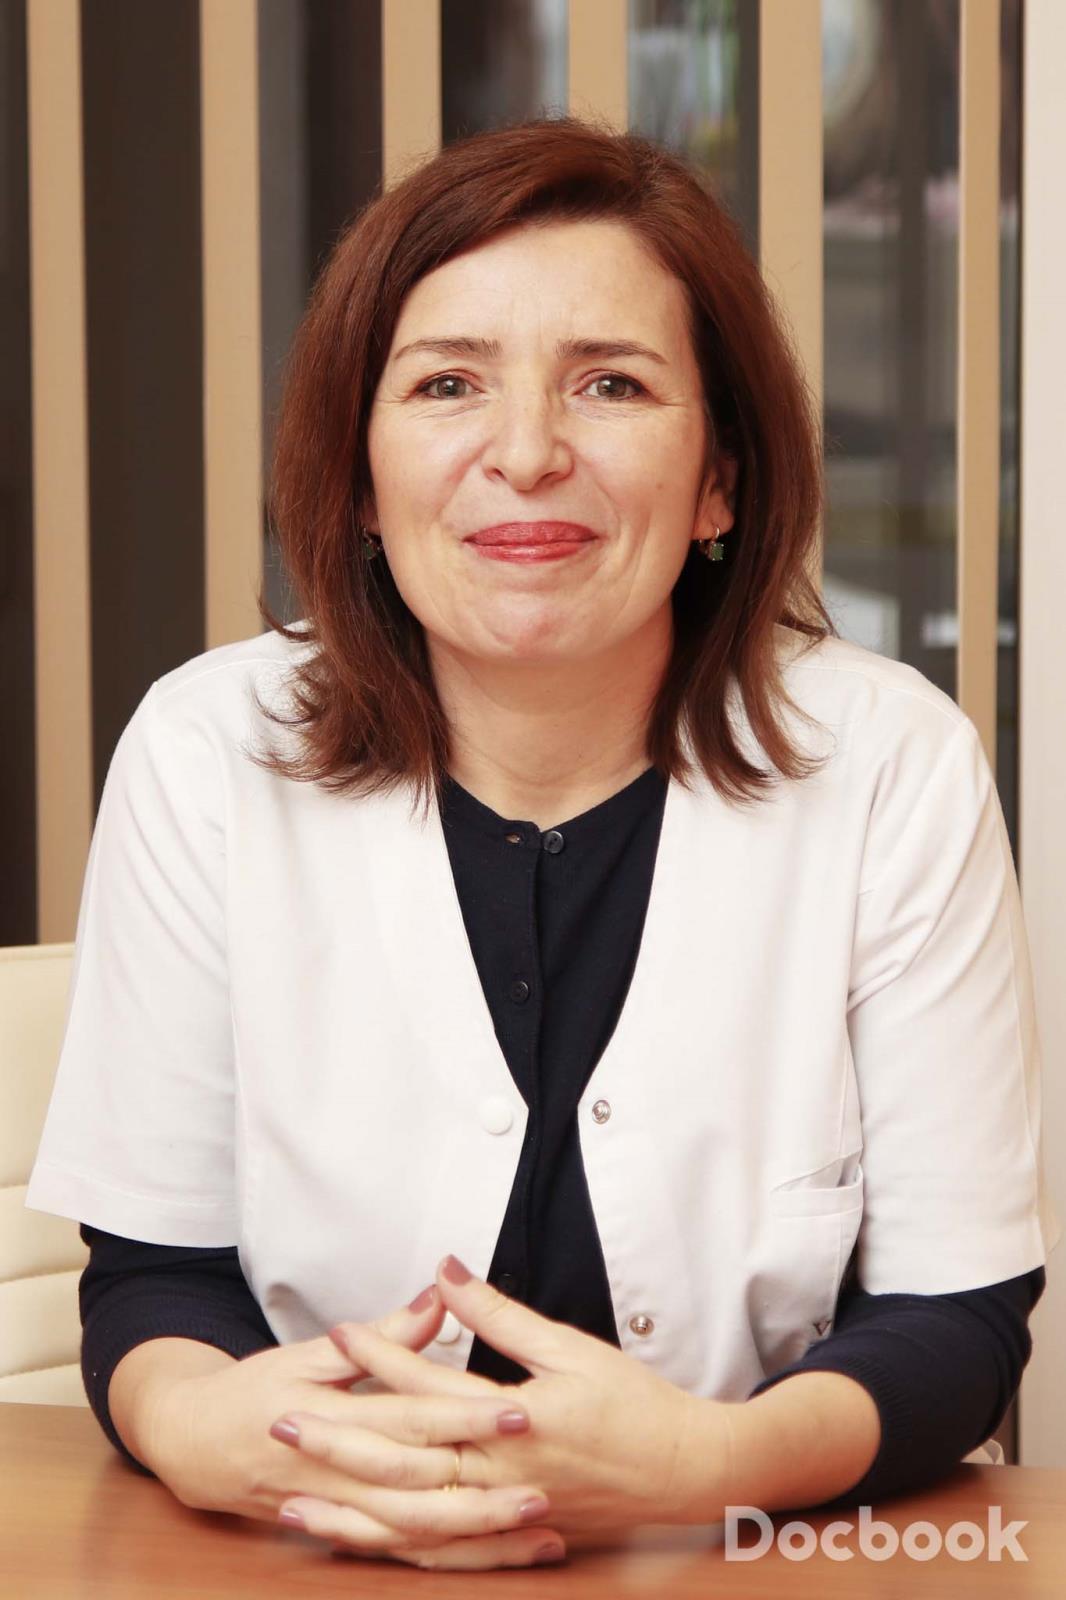 Dr. Mirela Mihaila